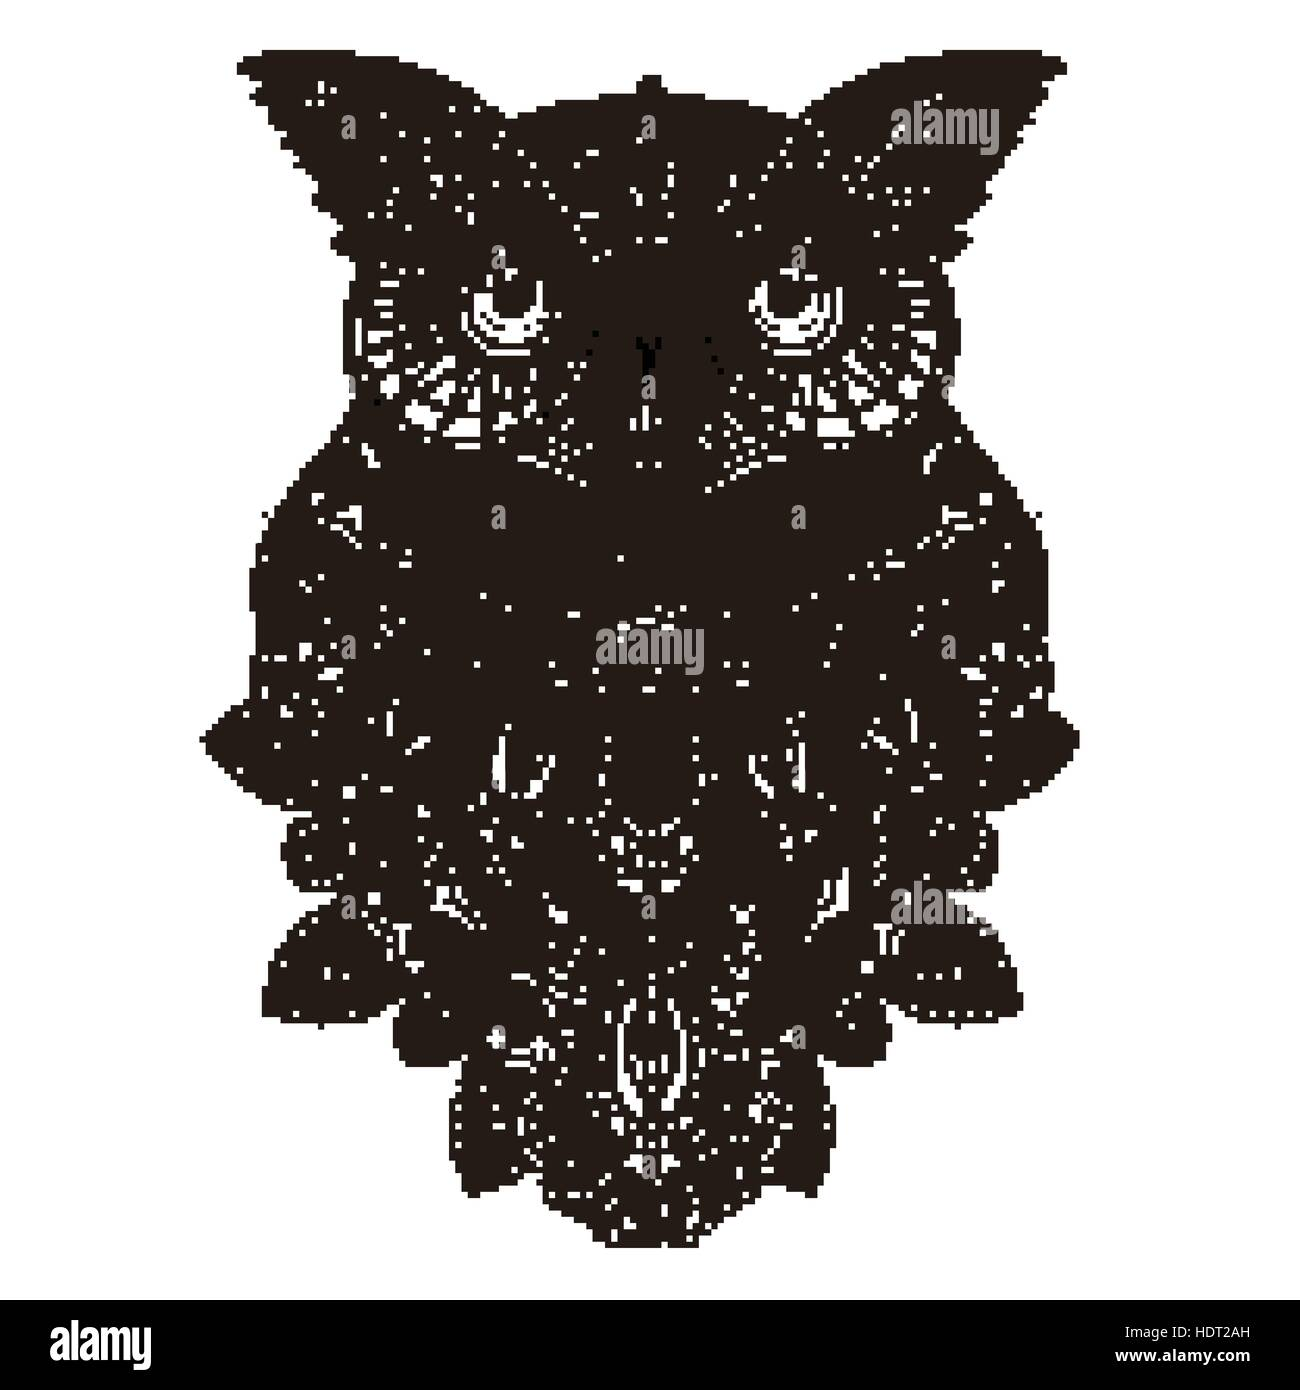 Owl Tattoo Stockfotos & Owl Tattoo Bilder - Seite 3 - Alamy